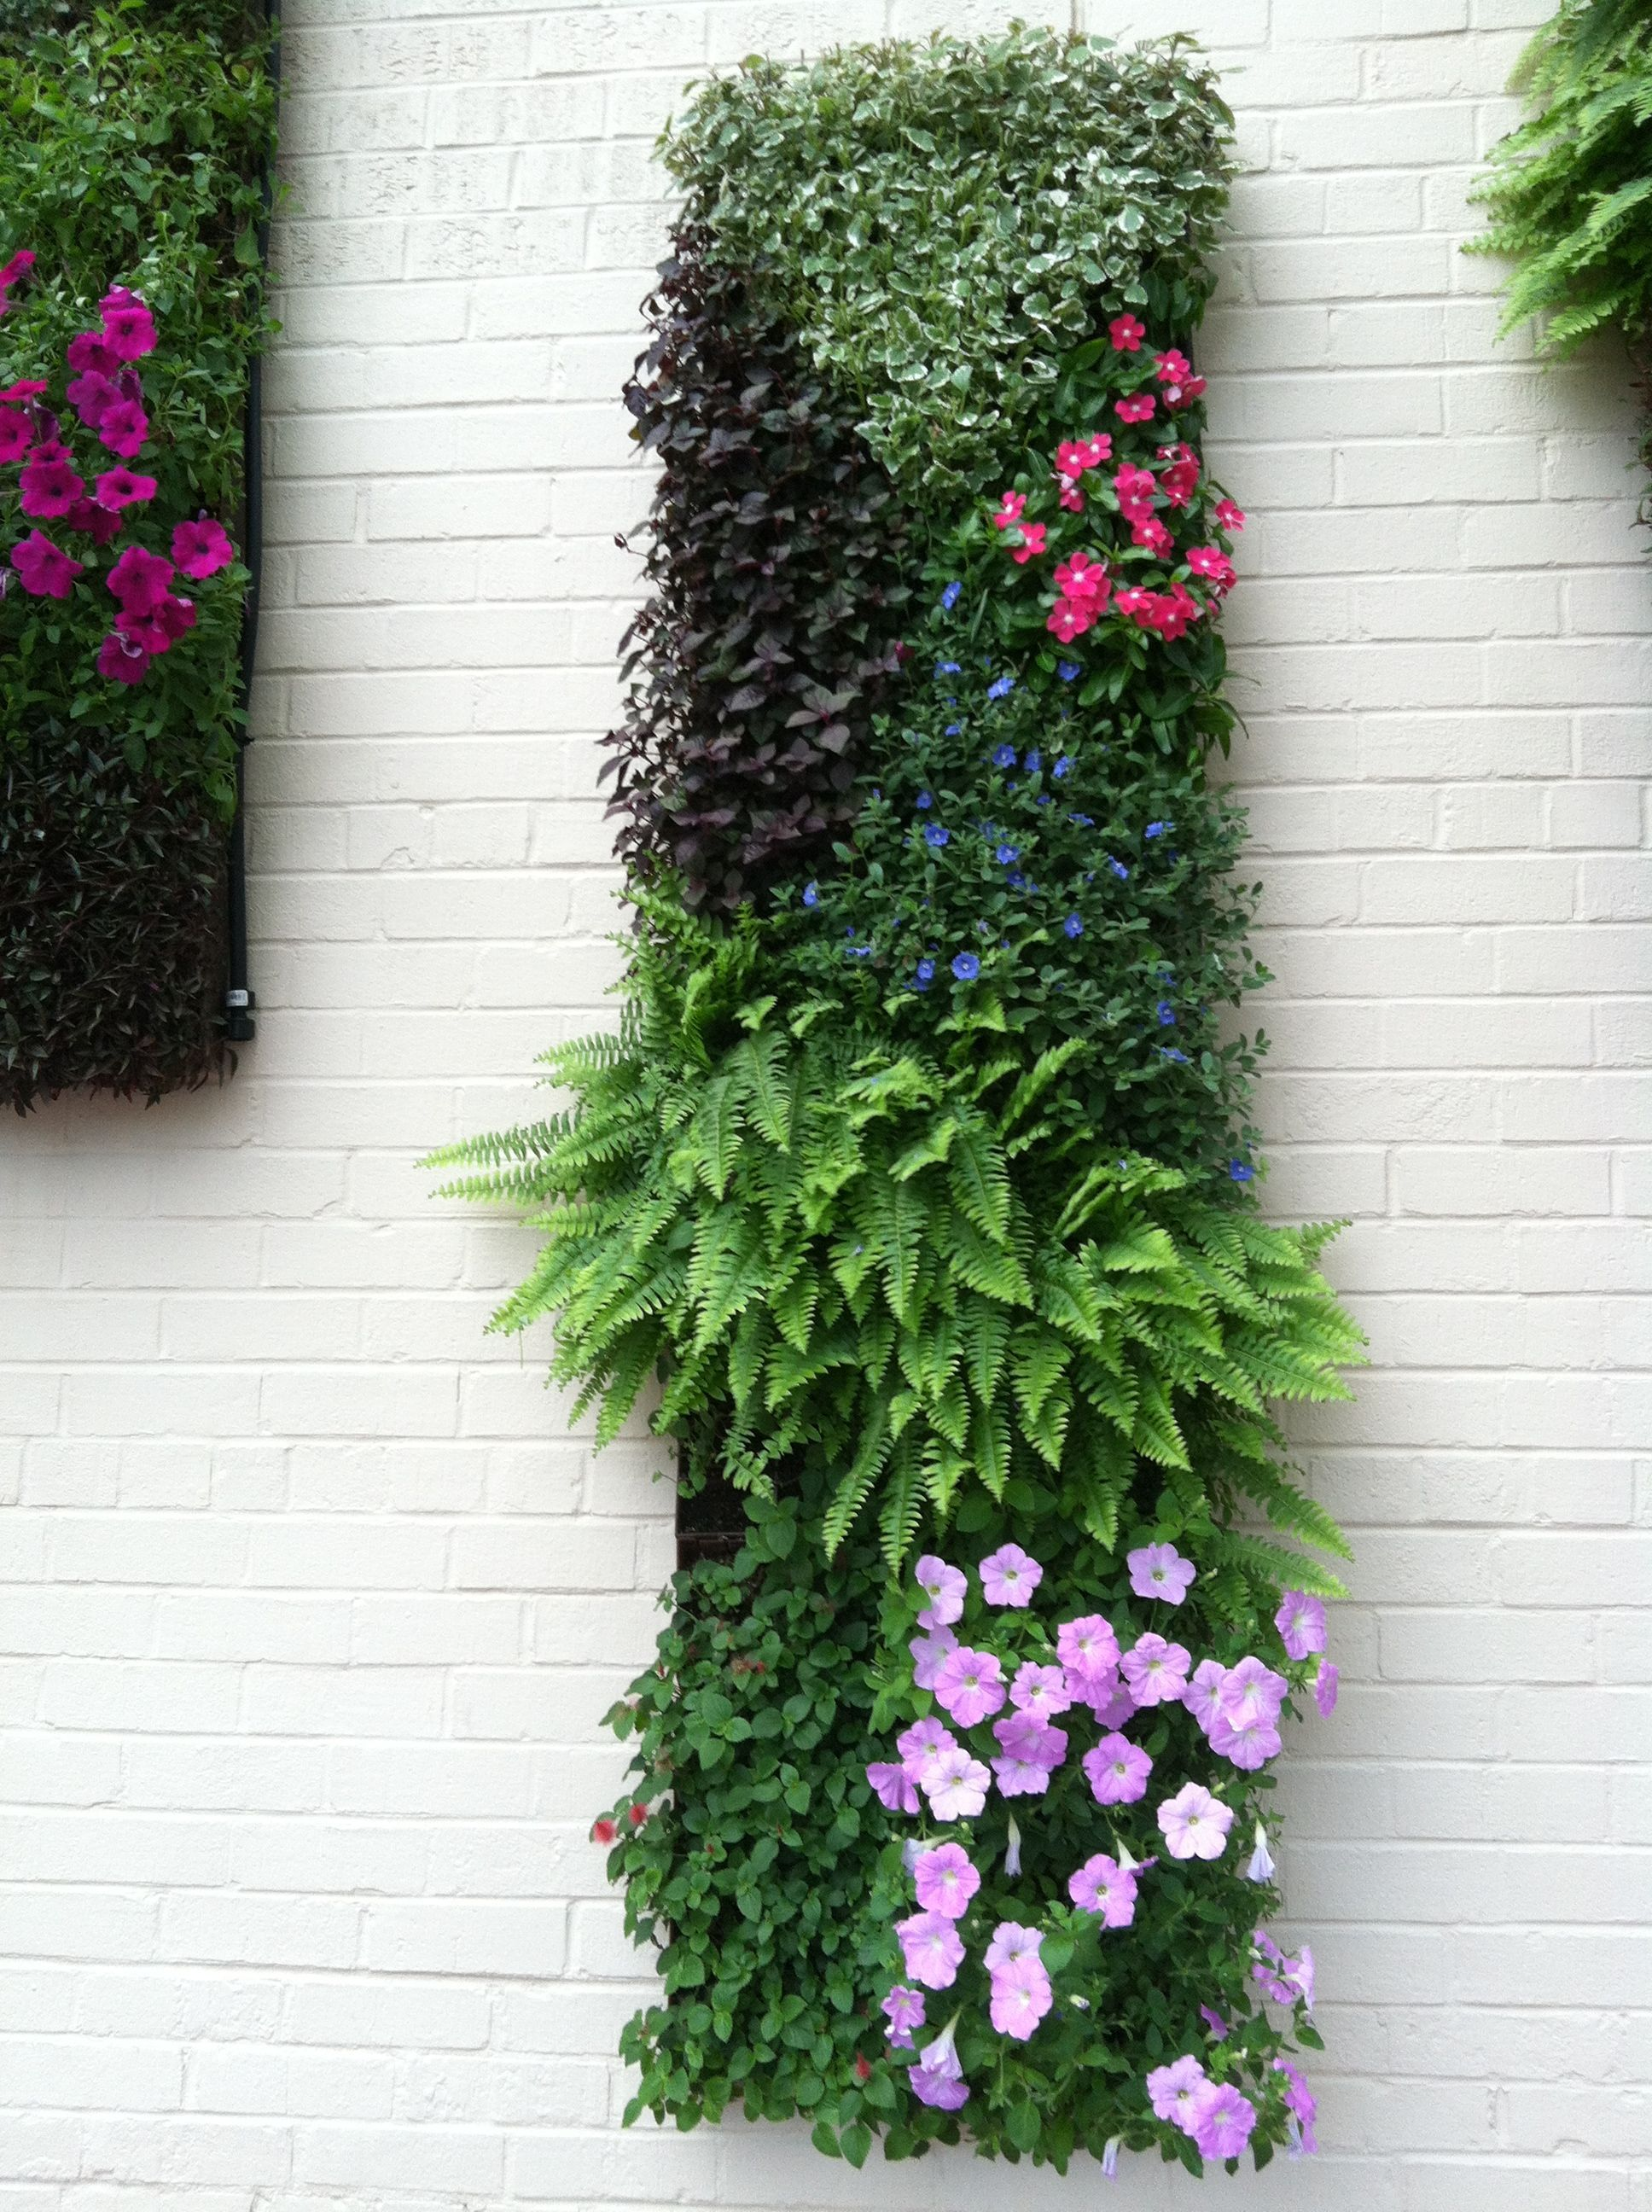 Hanging Indoor Plant of homes diana nice looking hanging vertical garden with green for skylight design